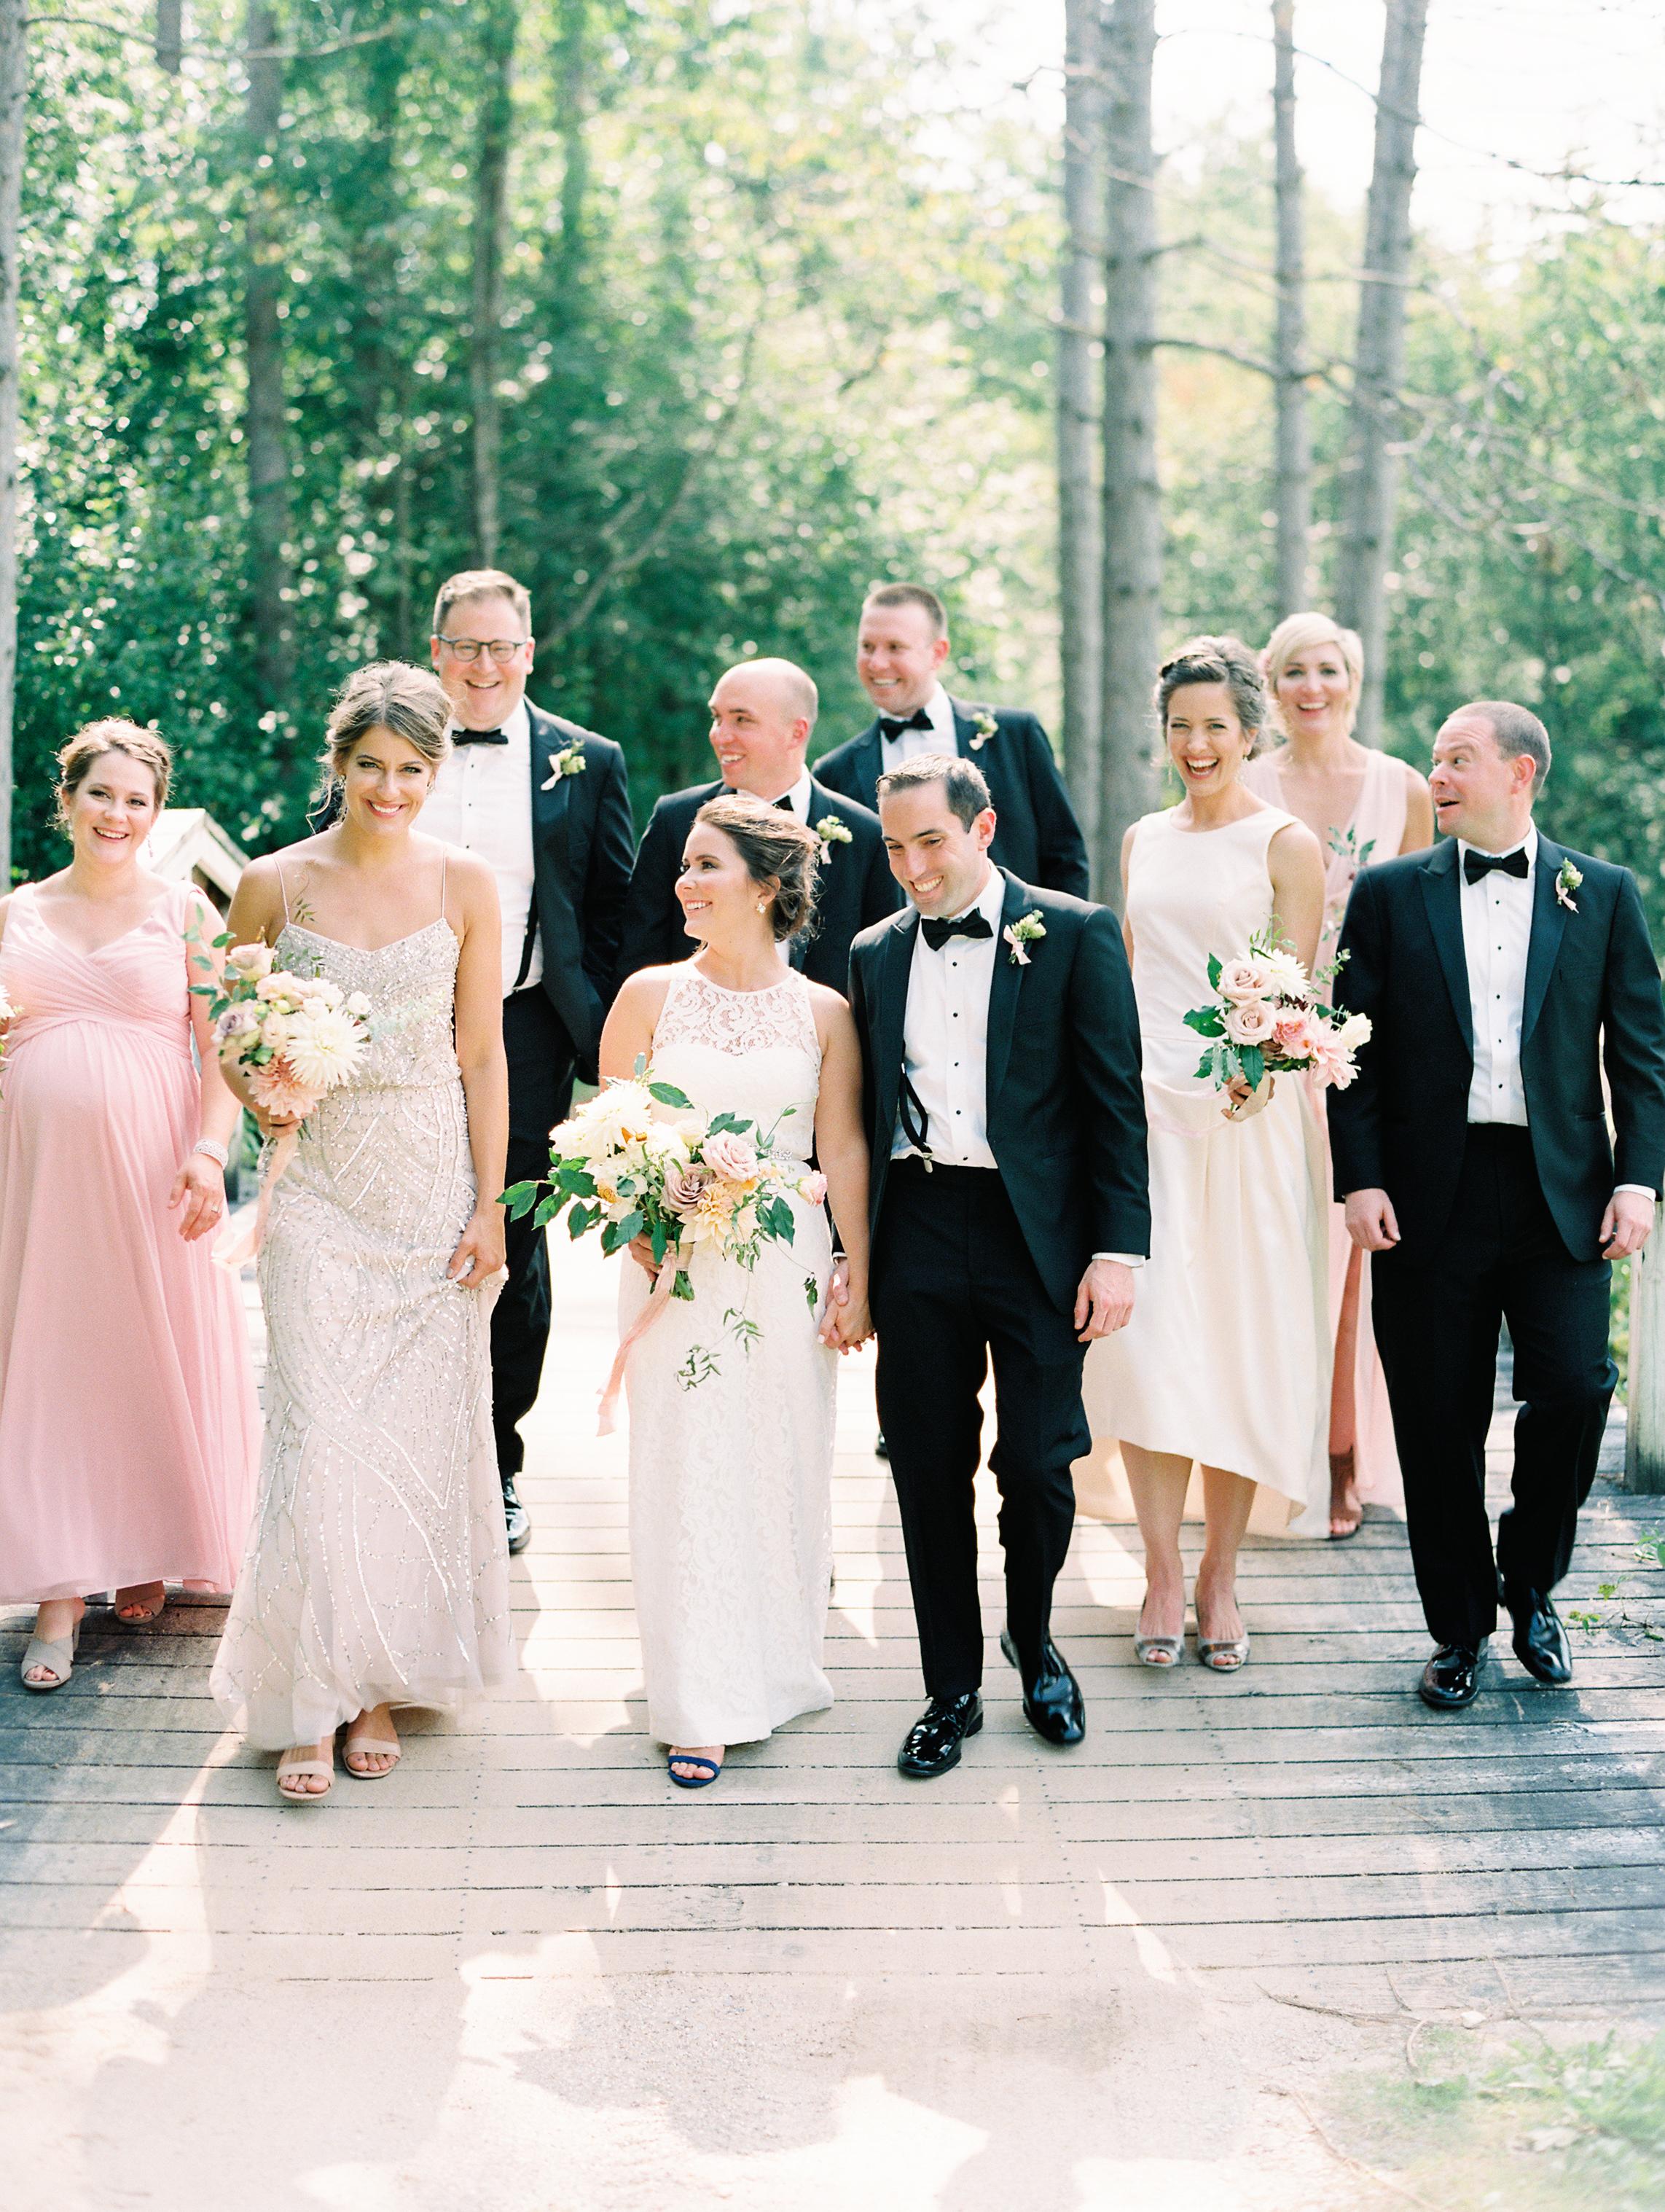 Zoller+Wedding+Bridal+Partyf-20.jpg